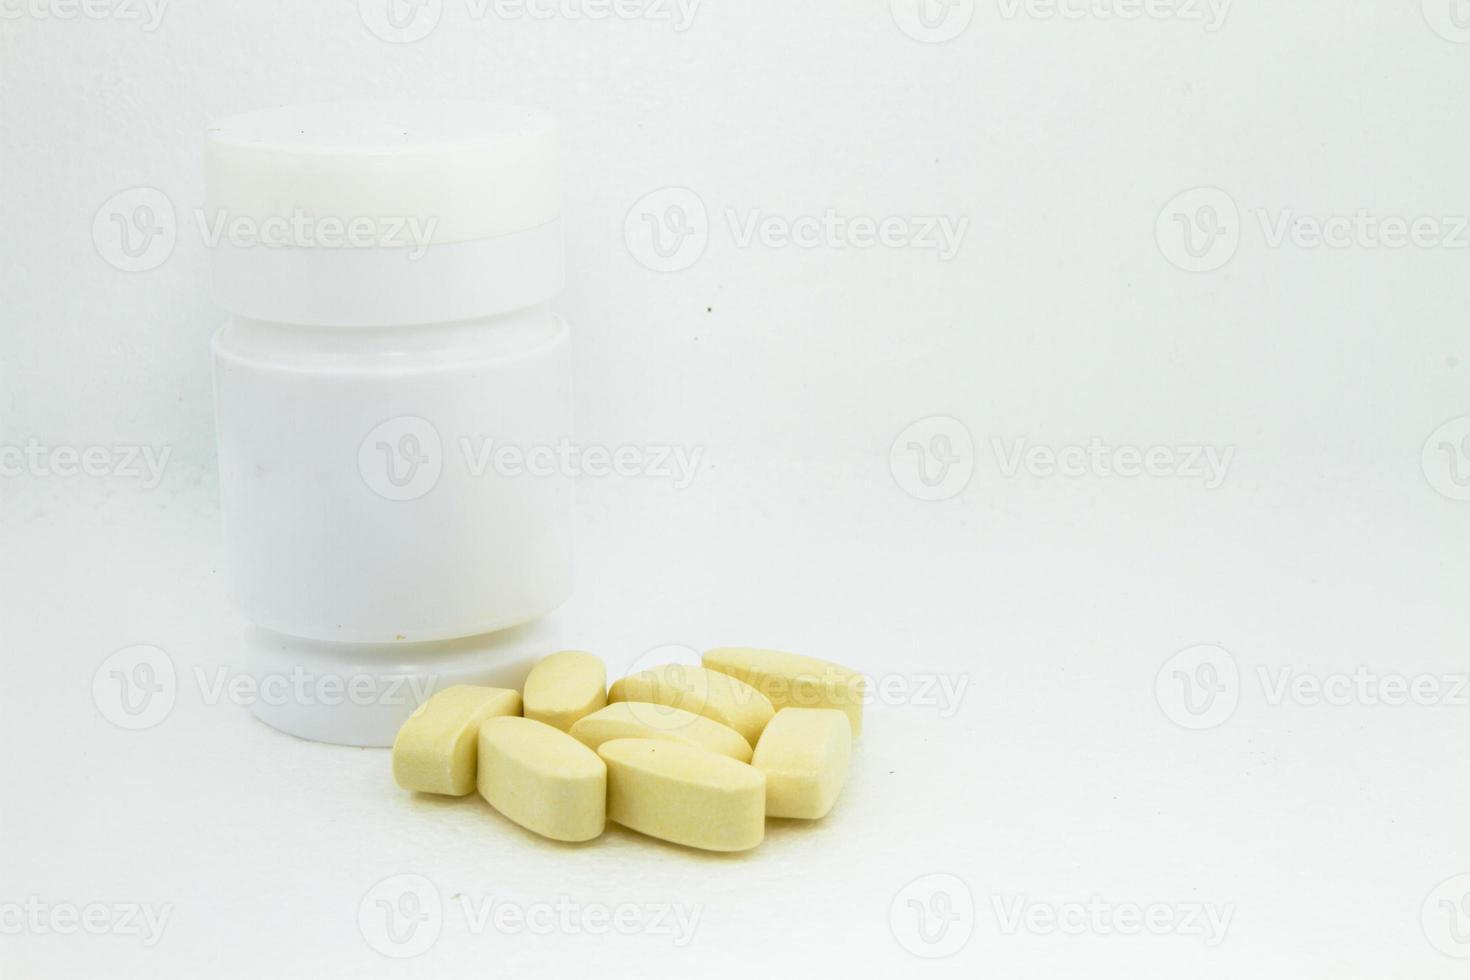 gelbe Medizin foto